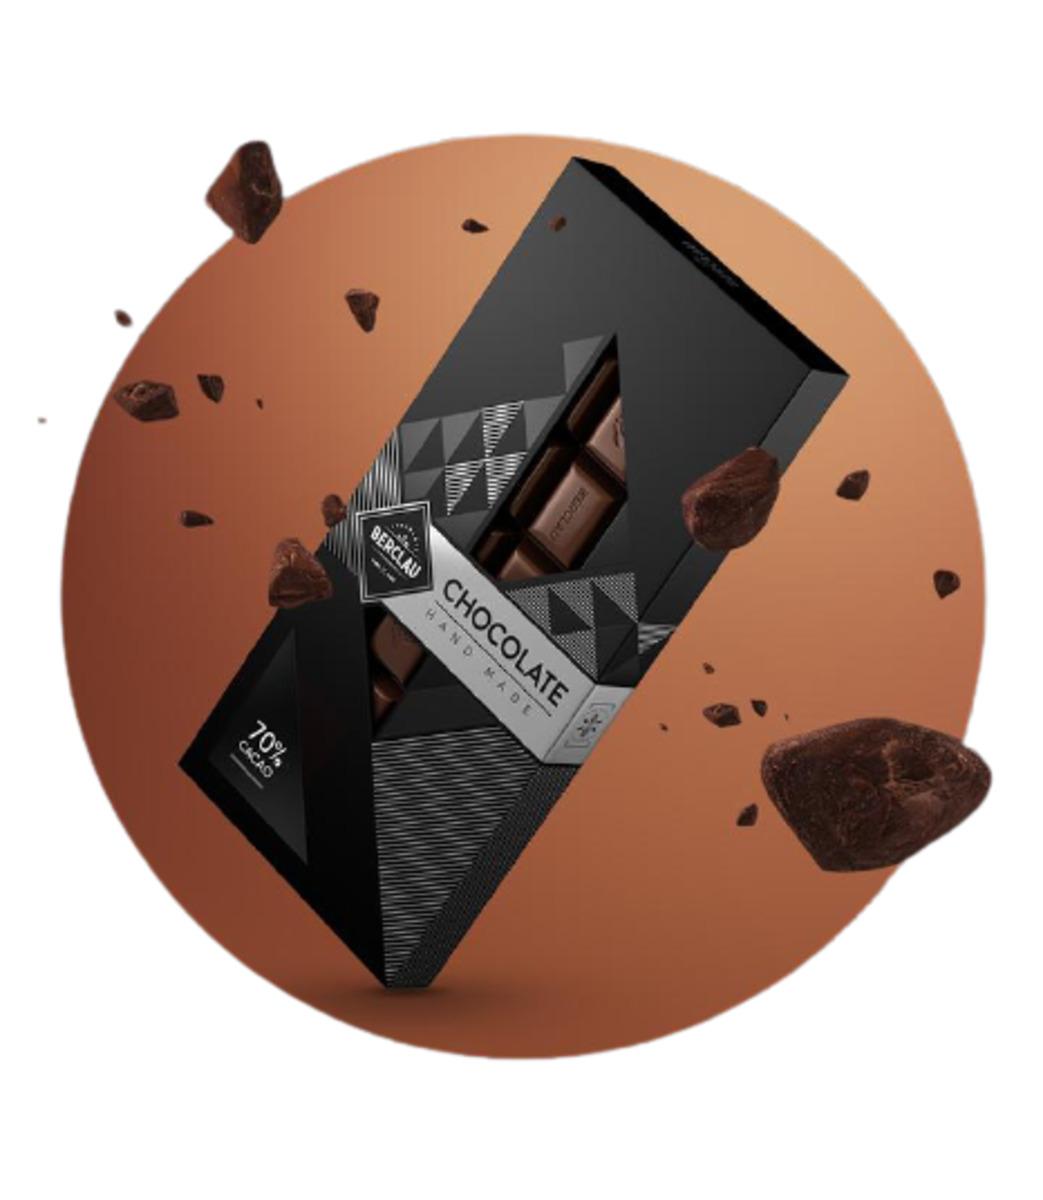 Chocolate Negro 70% Cacao Berclau